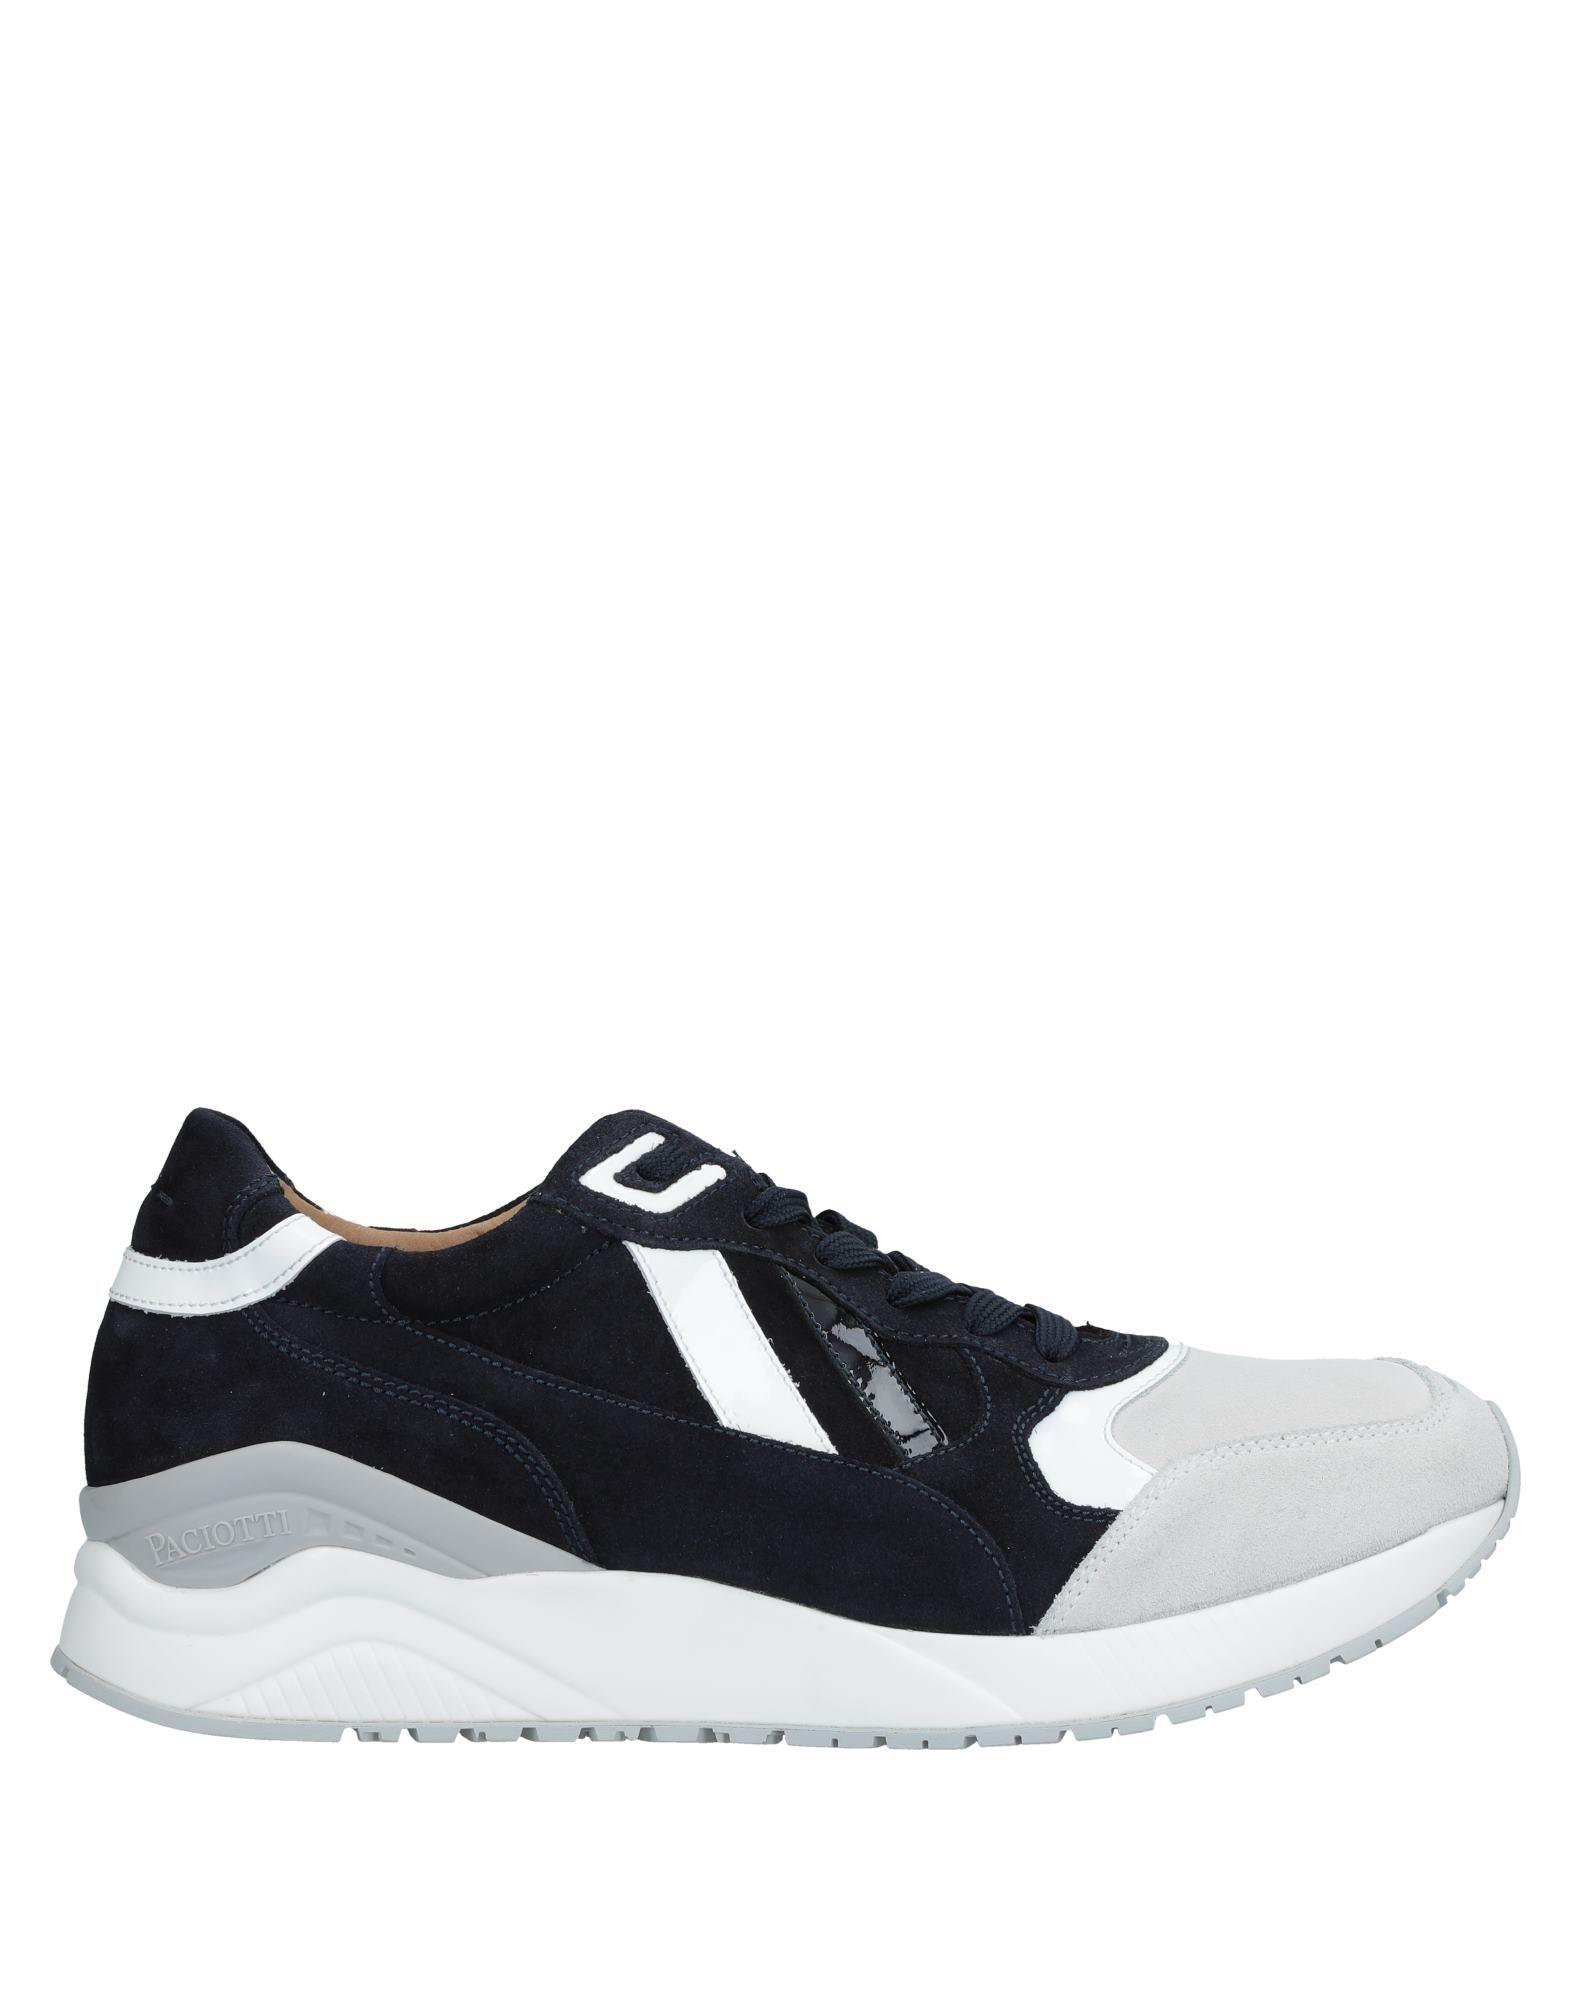 Sneakers Cesare Paciotti 4Us Uomo - 11536607IA